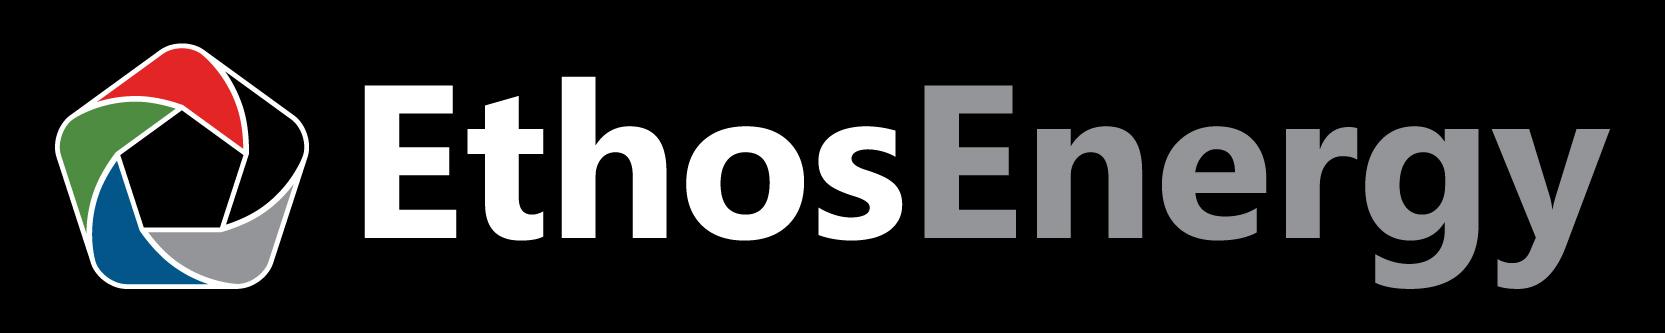 EthosEnergy_Logo_no-tagline_Final_Blk_Bkg_JPG_RGB